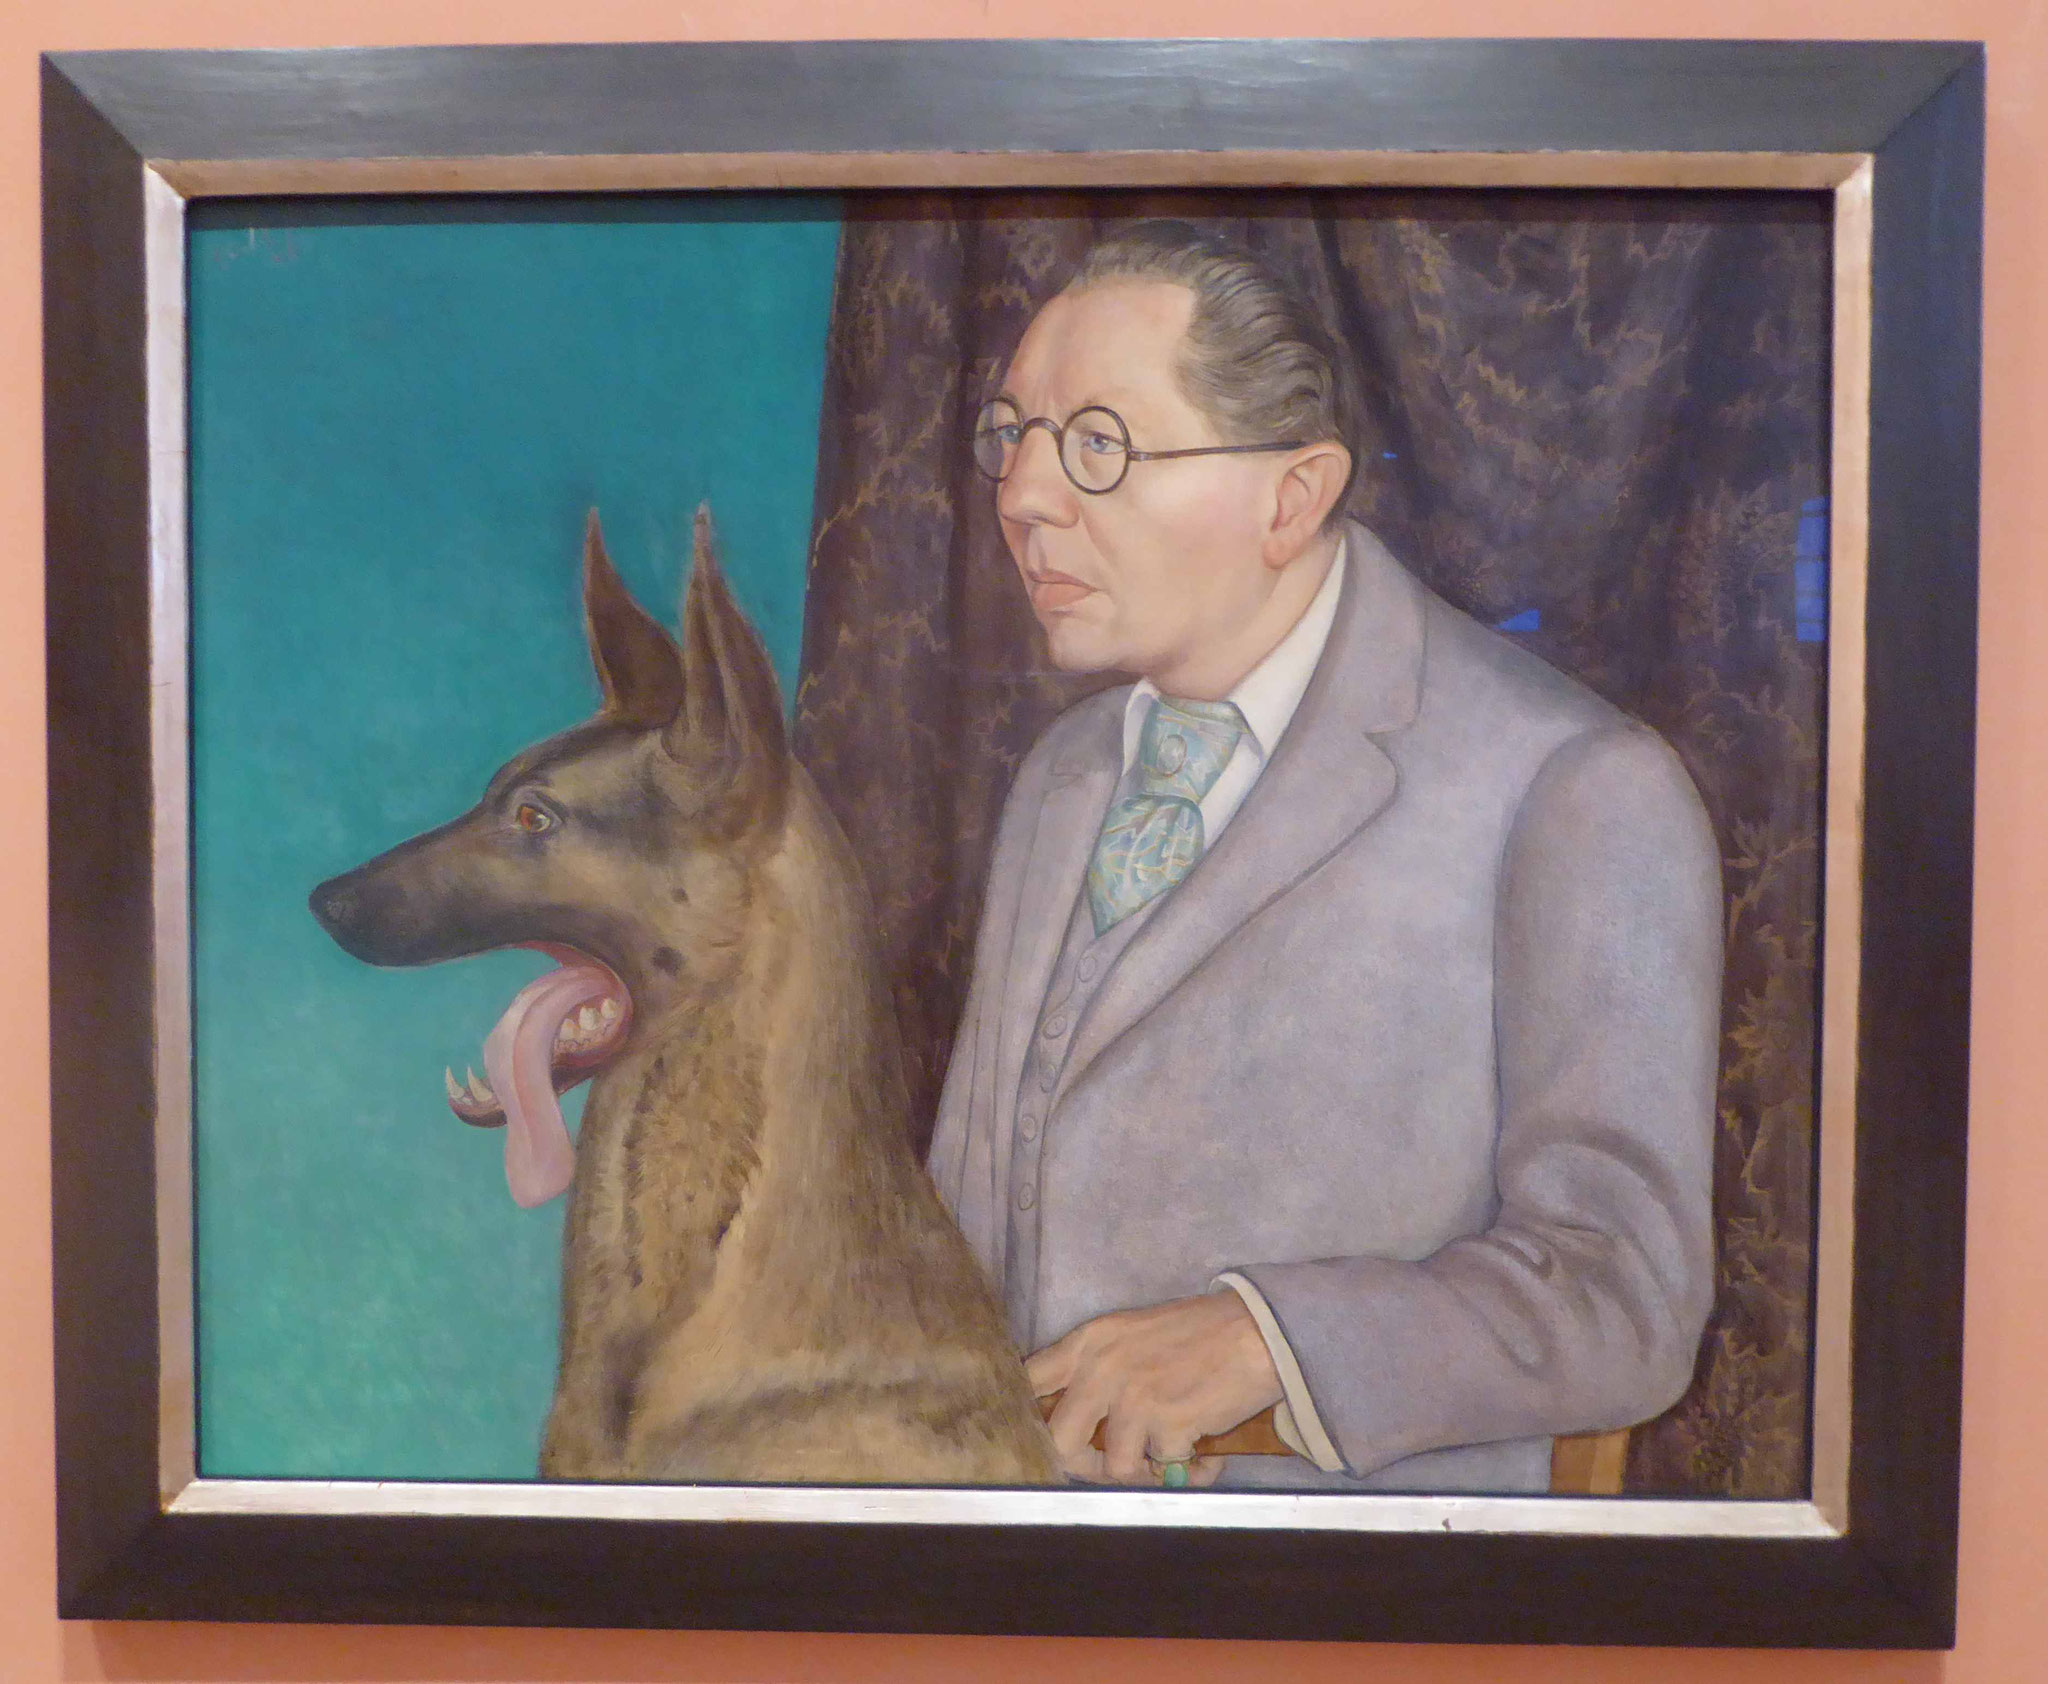 Otto Dix, Museo Thyssen-Bornemisza, Madrid, Spanien